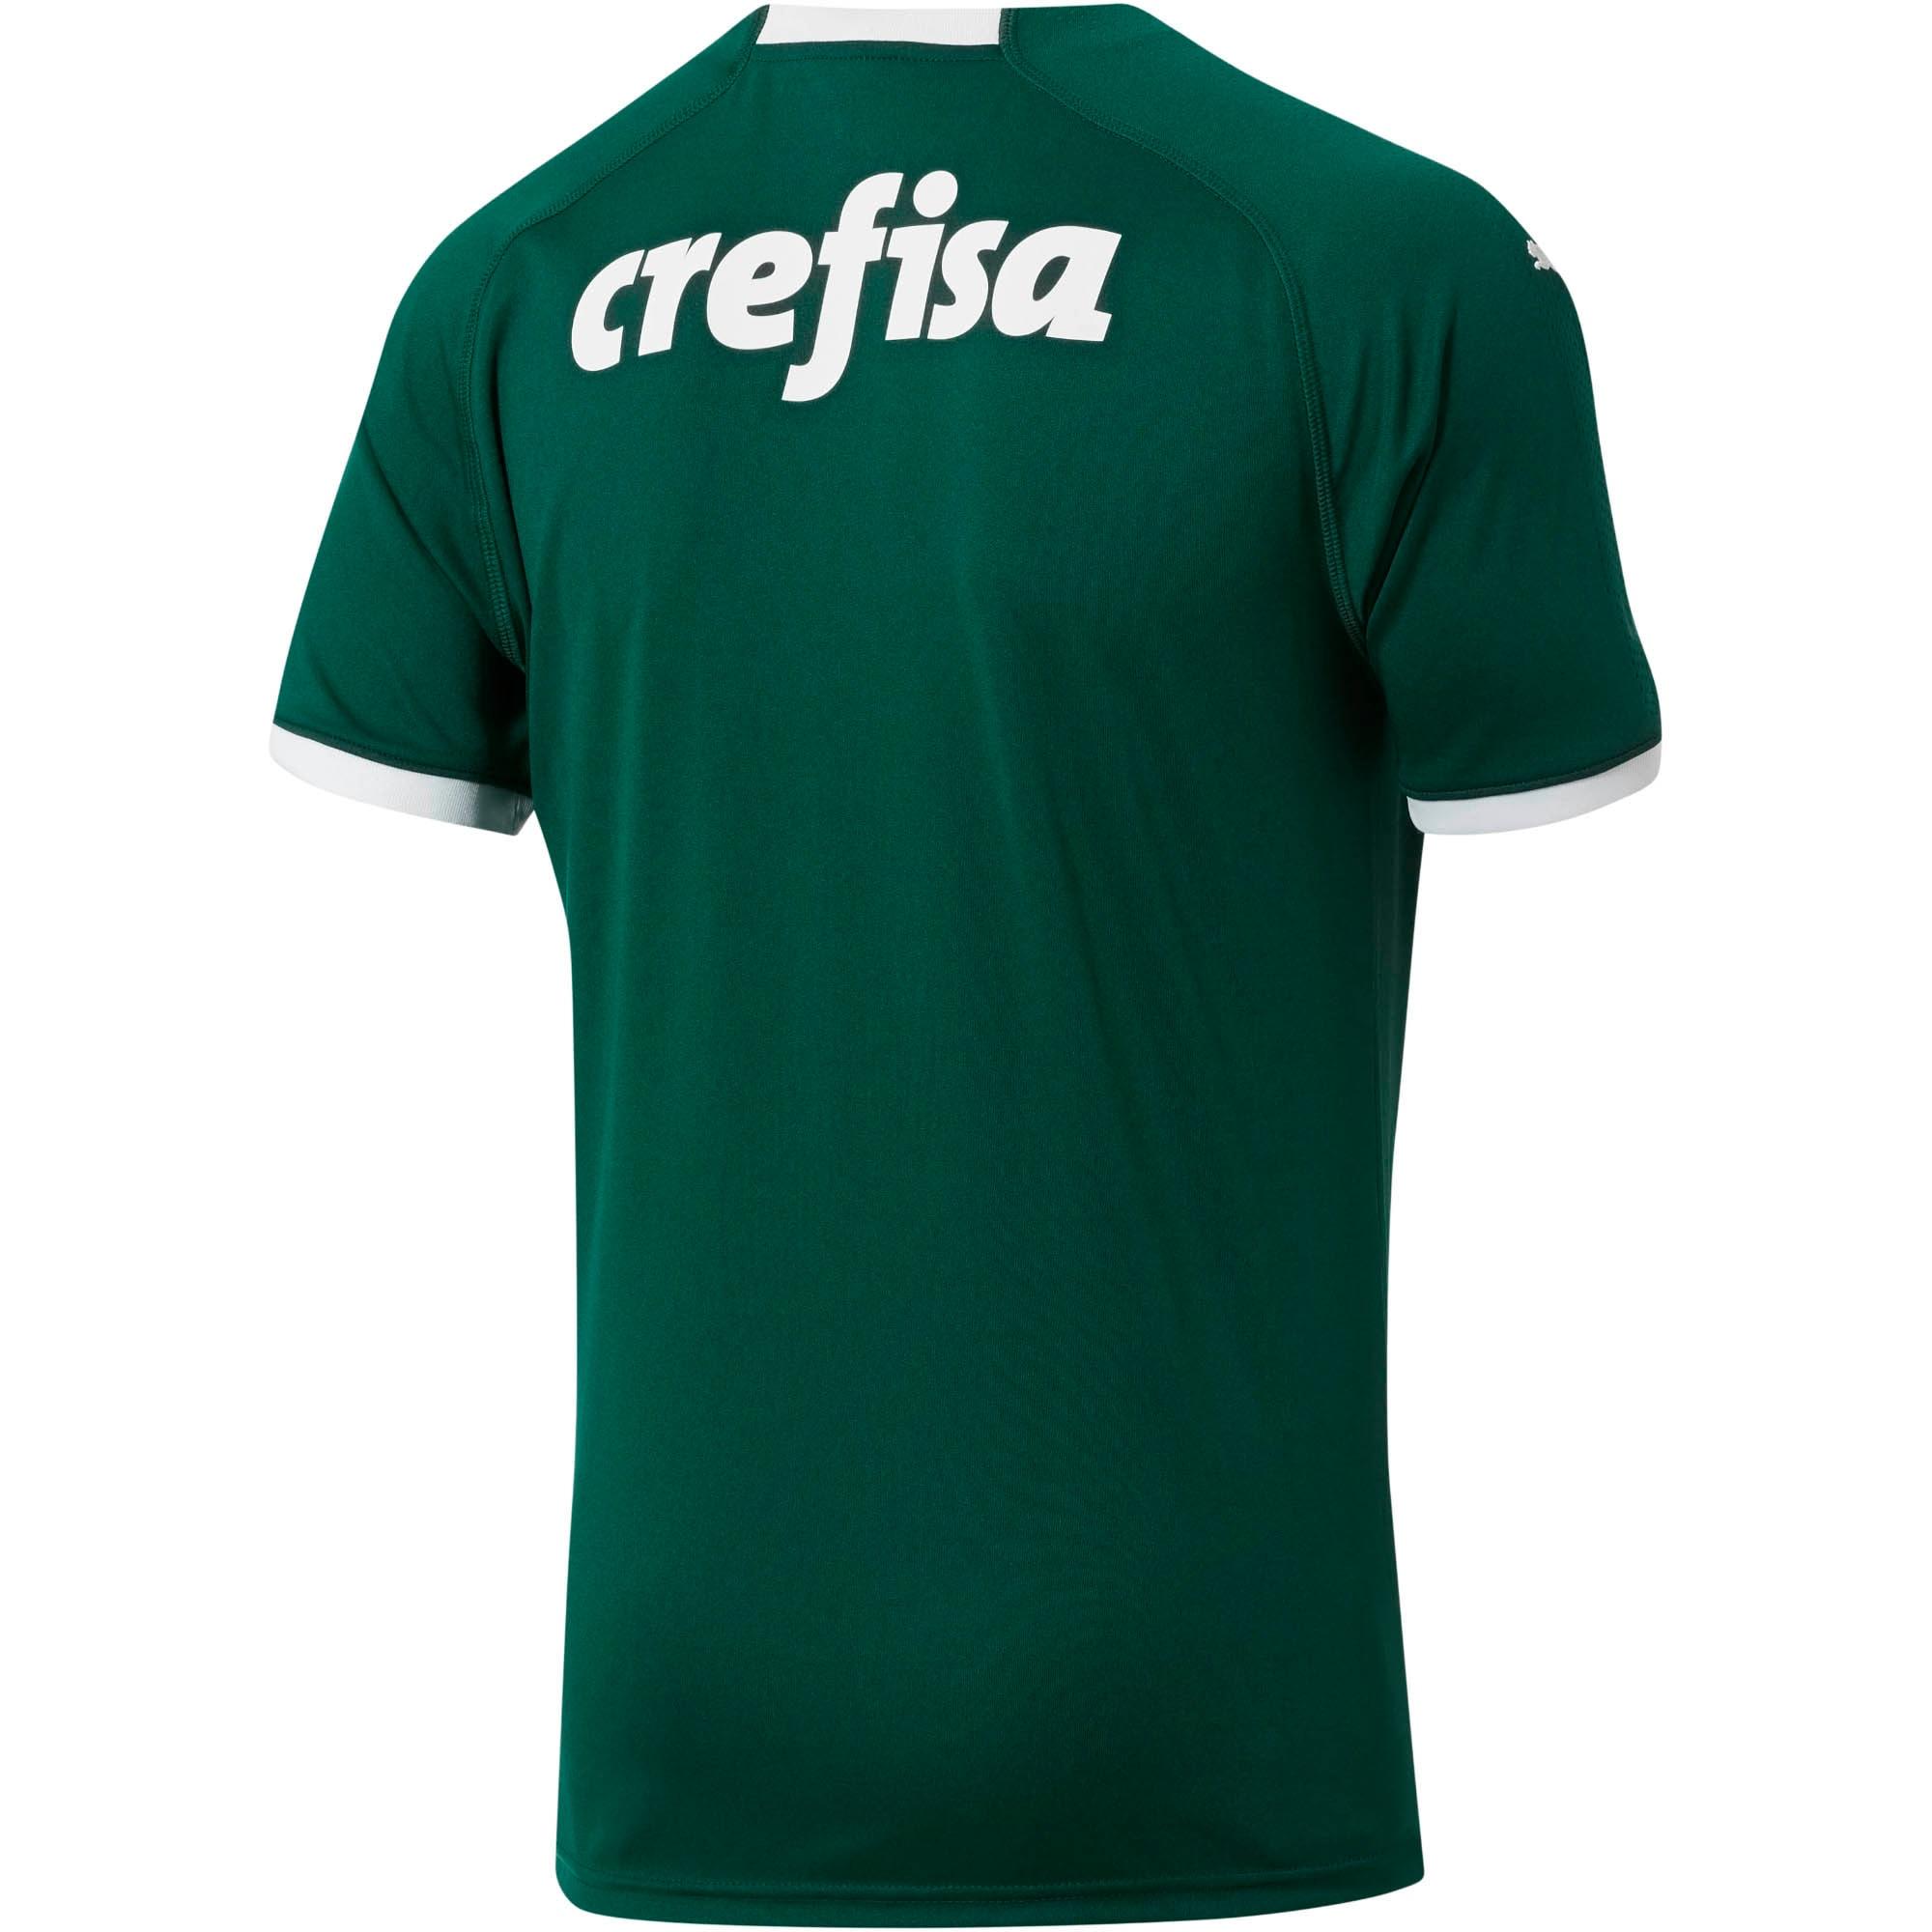 Thumbnail 3 of Palmeiras Home Replica Jersey I, Pepper Green, medium